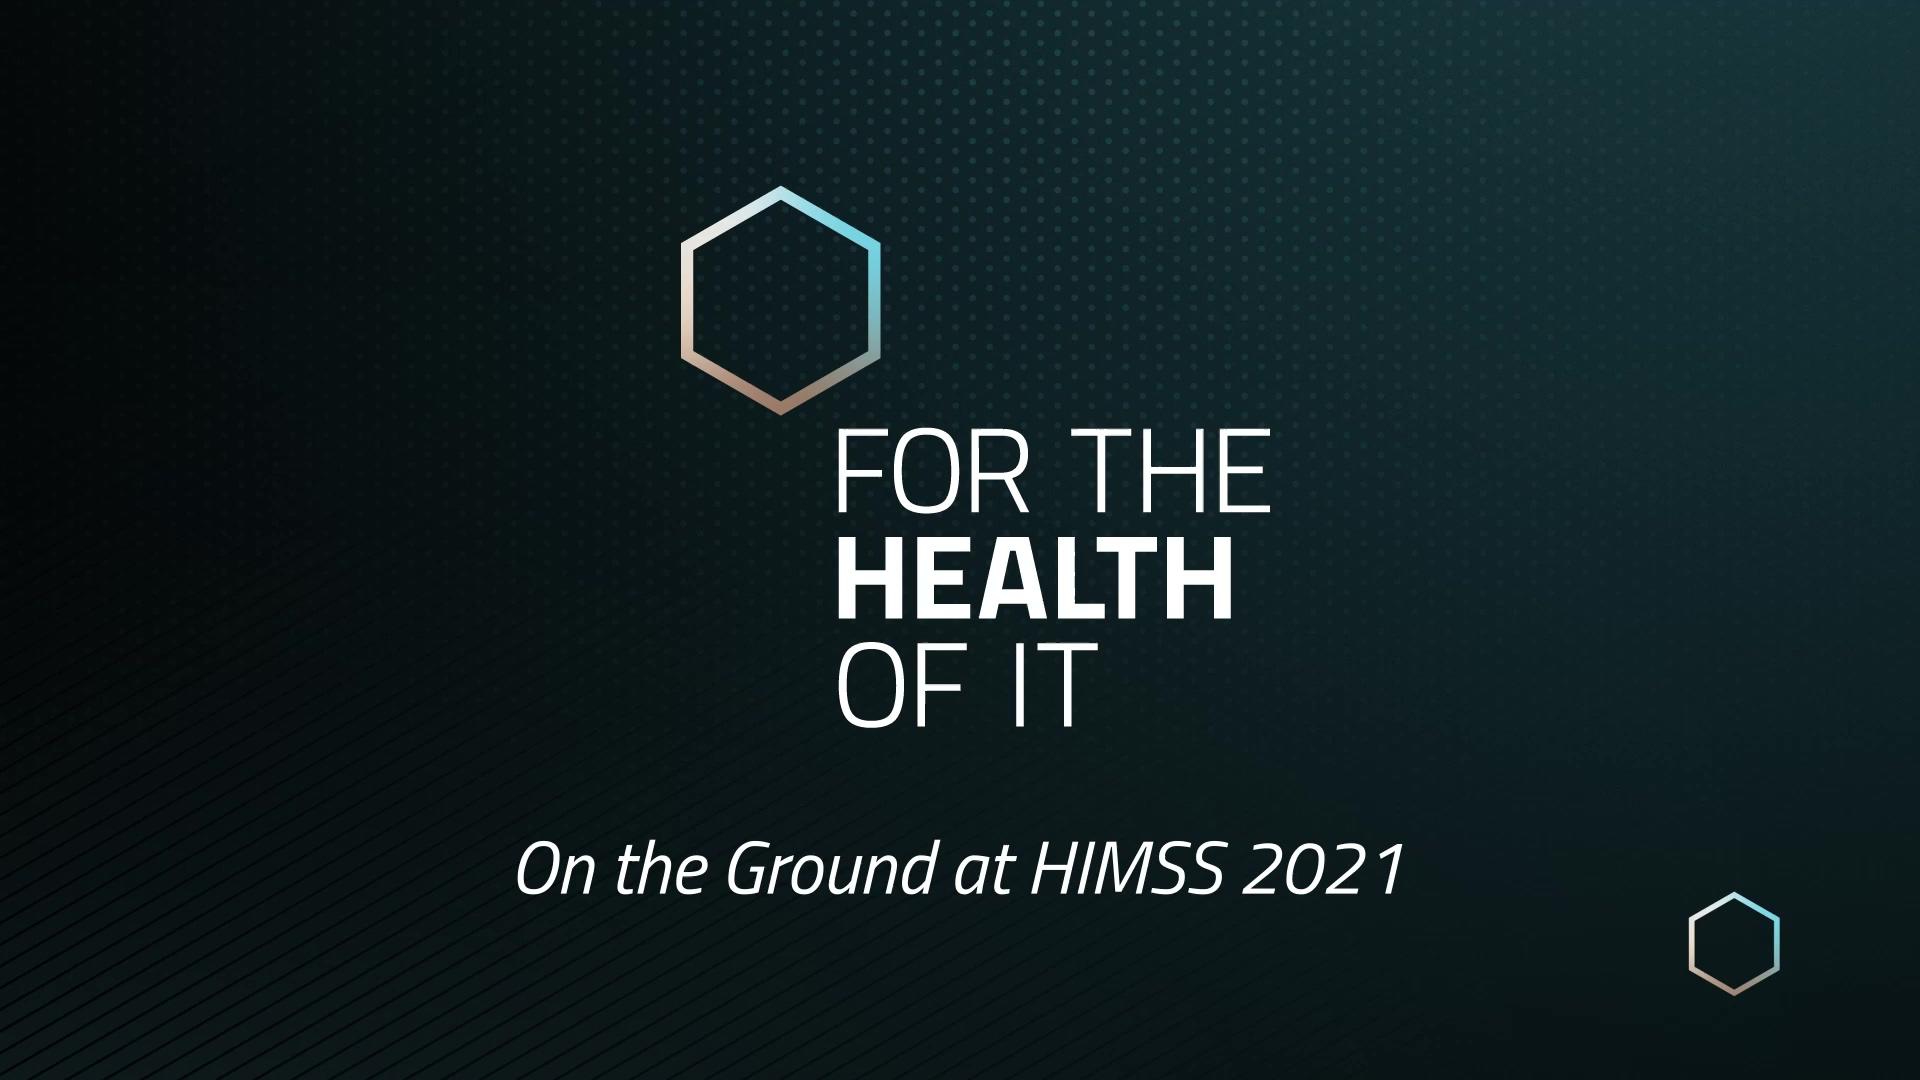 Komodo_ On the Ground at HIMSS 2021